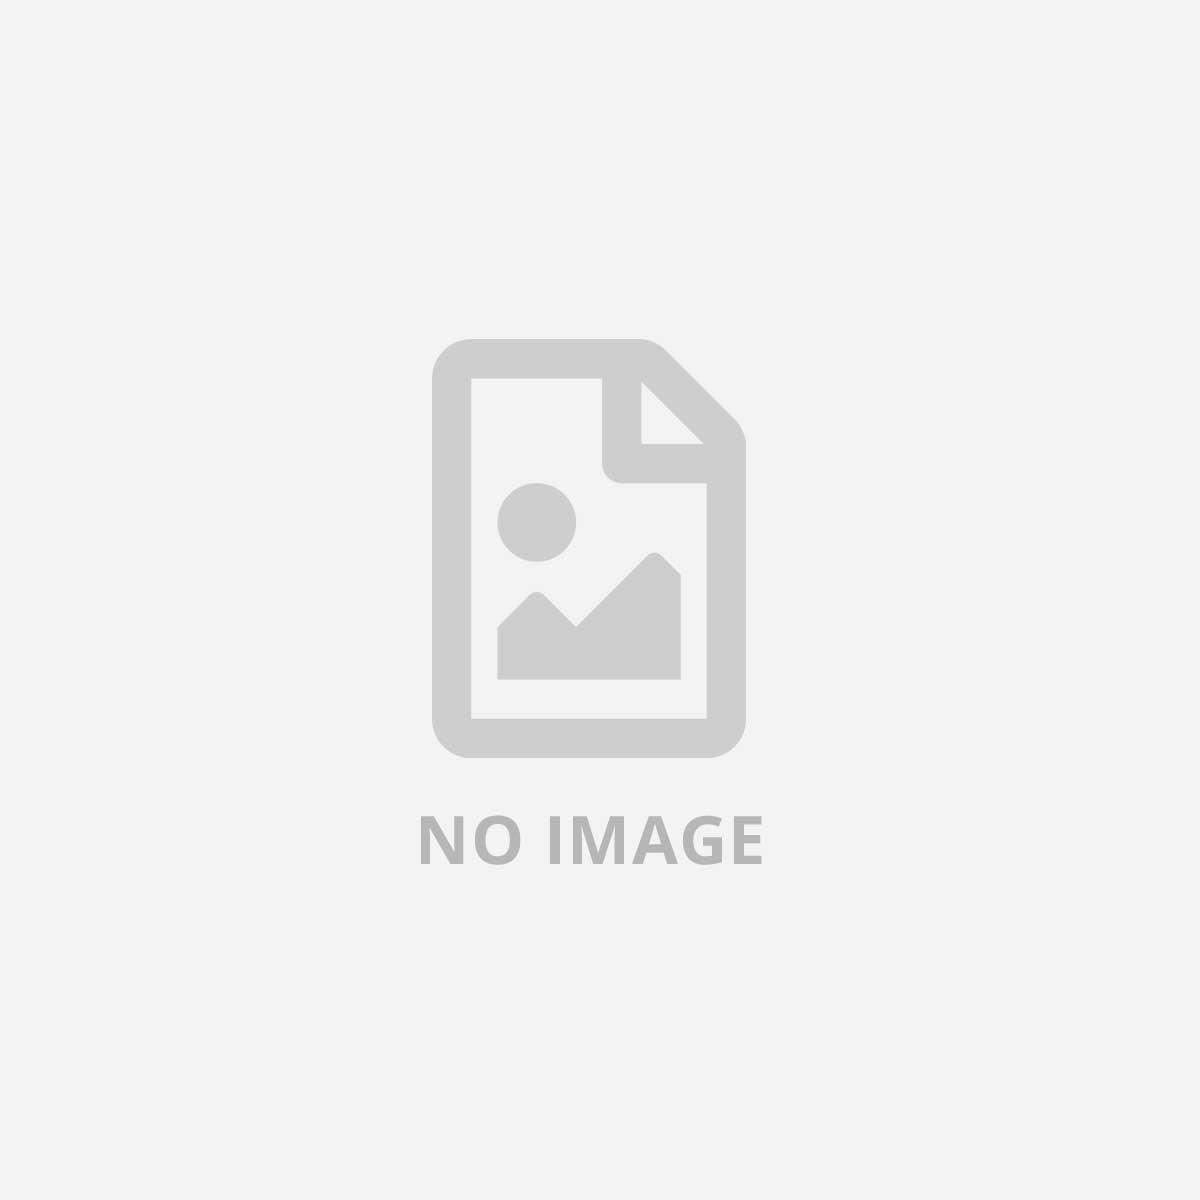 WATCHGUARD CABLE KIT 8 E 5 SERIES